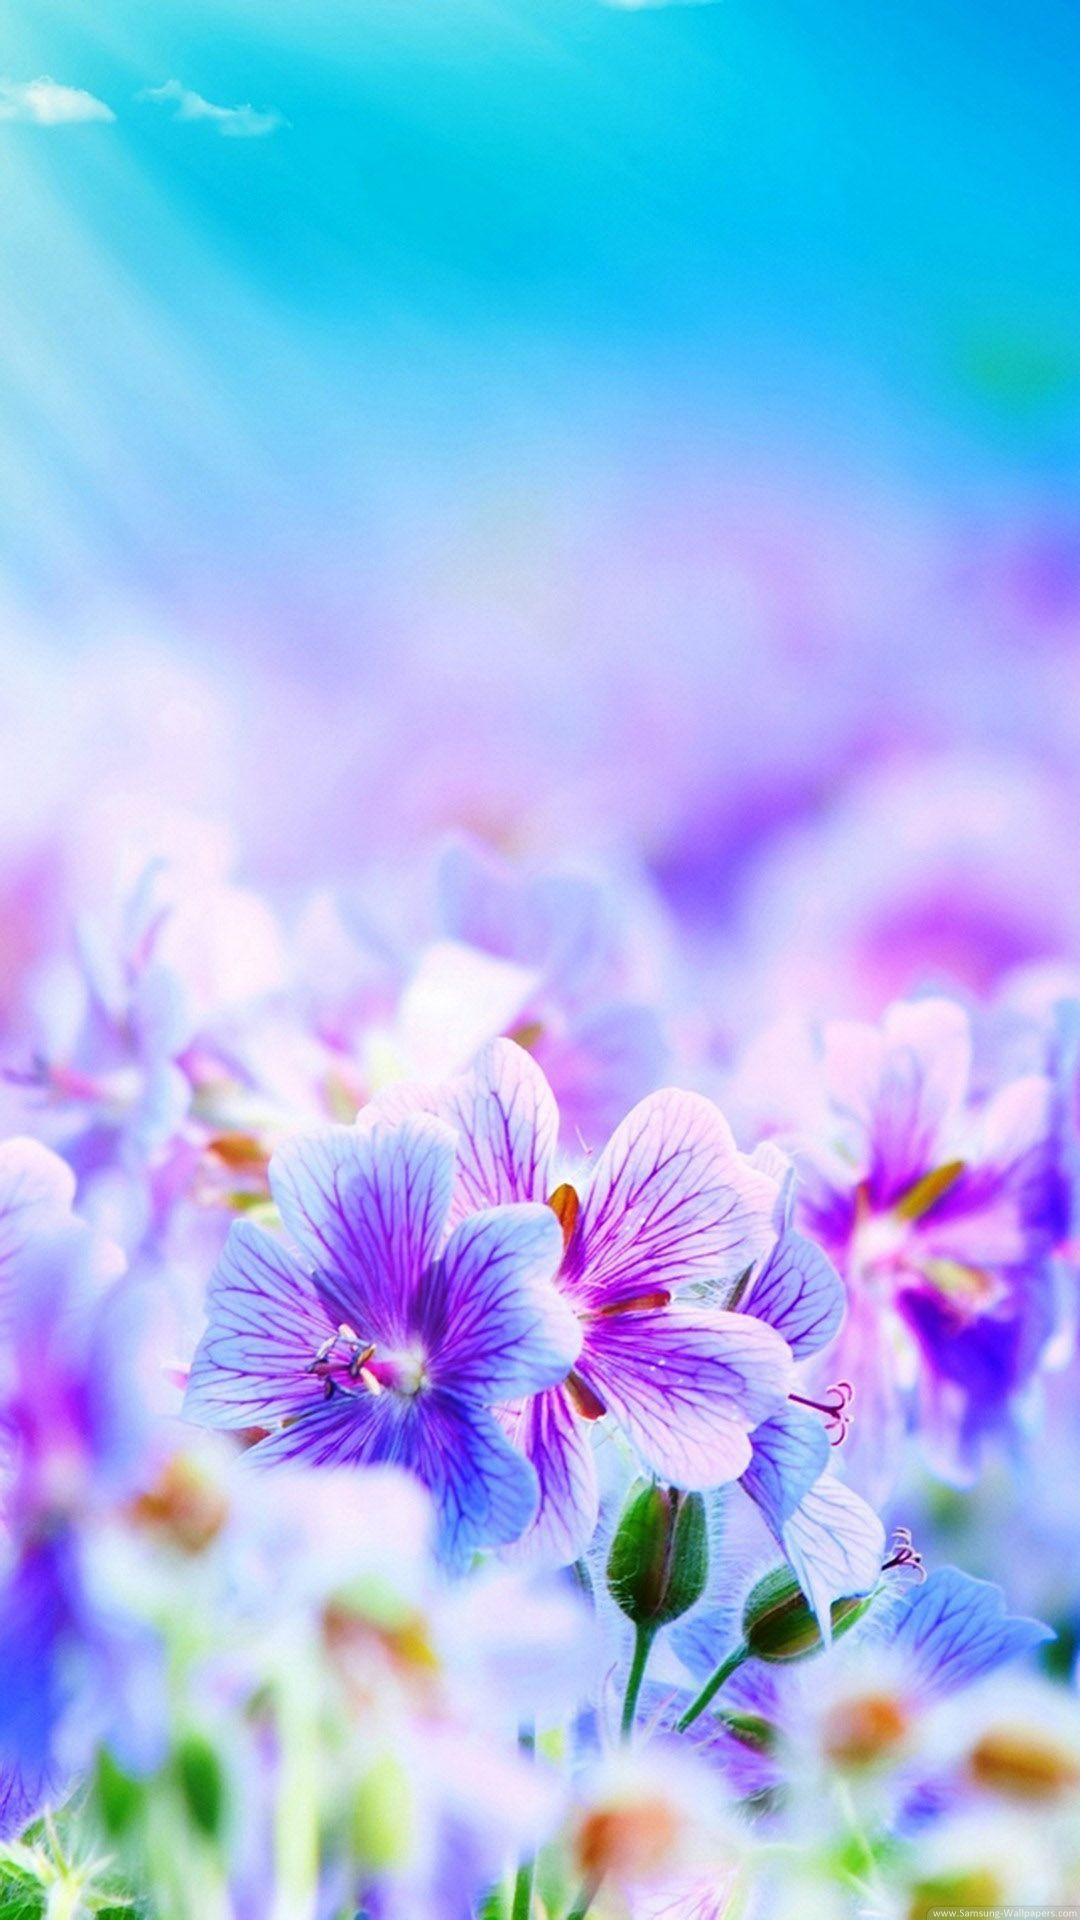 Beautiful desktop wallpaper– HD HQ Wallpapers Download